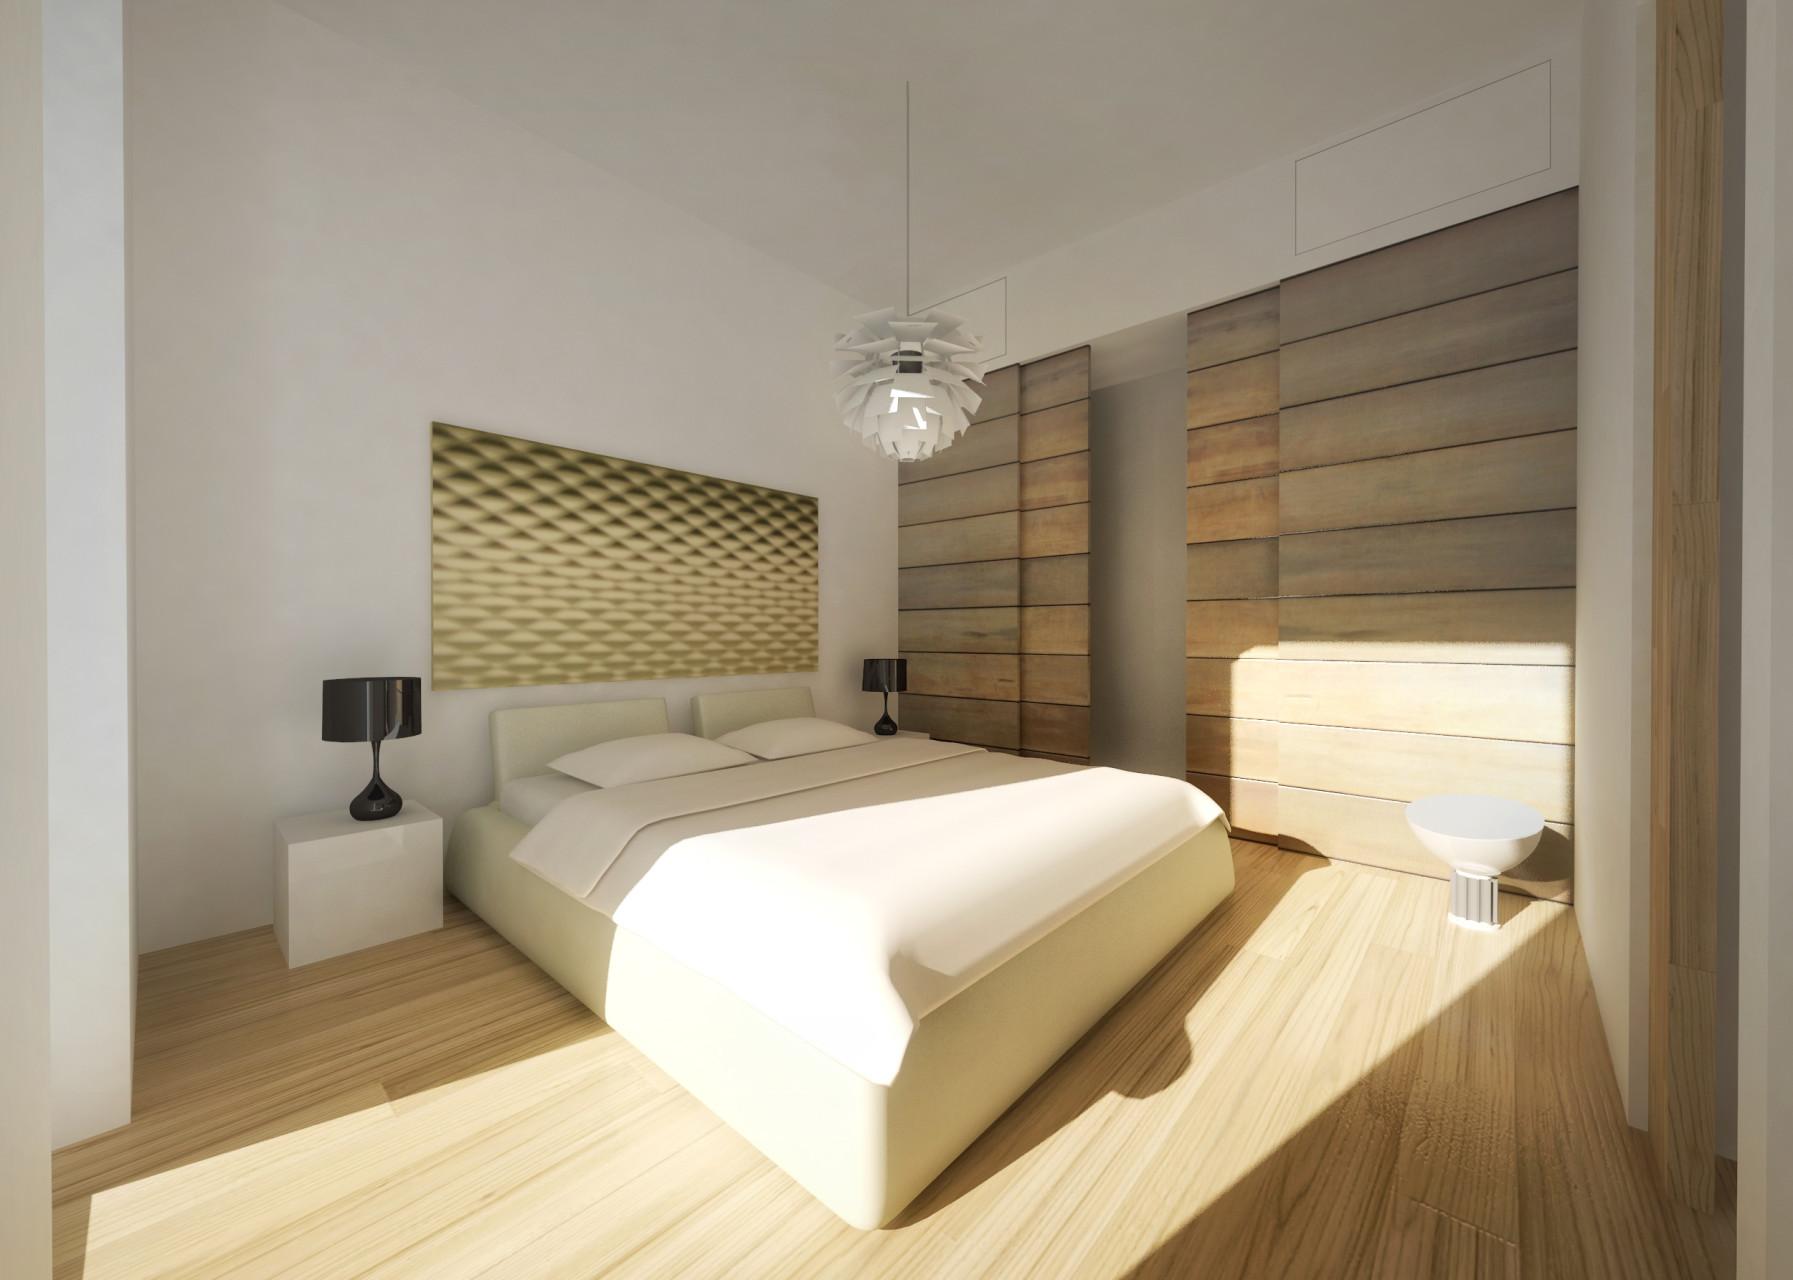 Wisp-Architects-Apartment-Milan 3